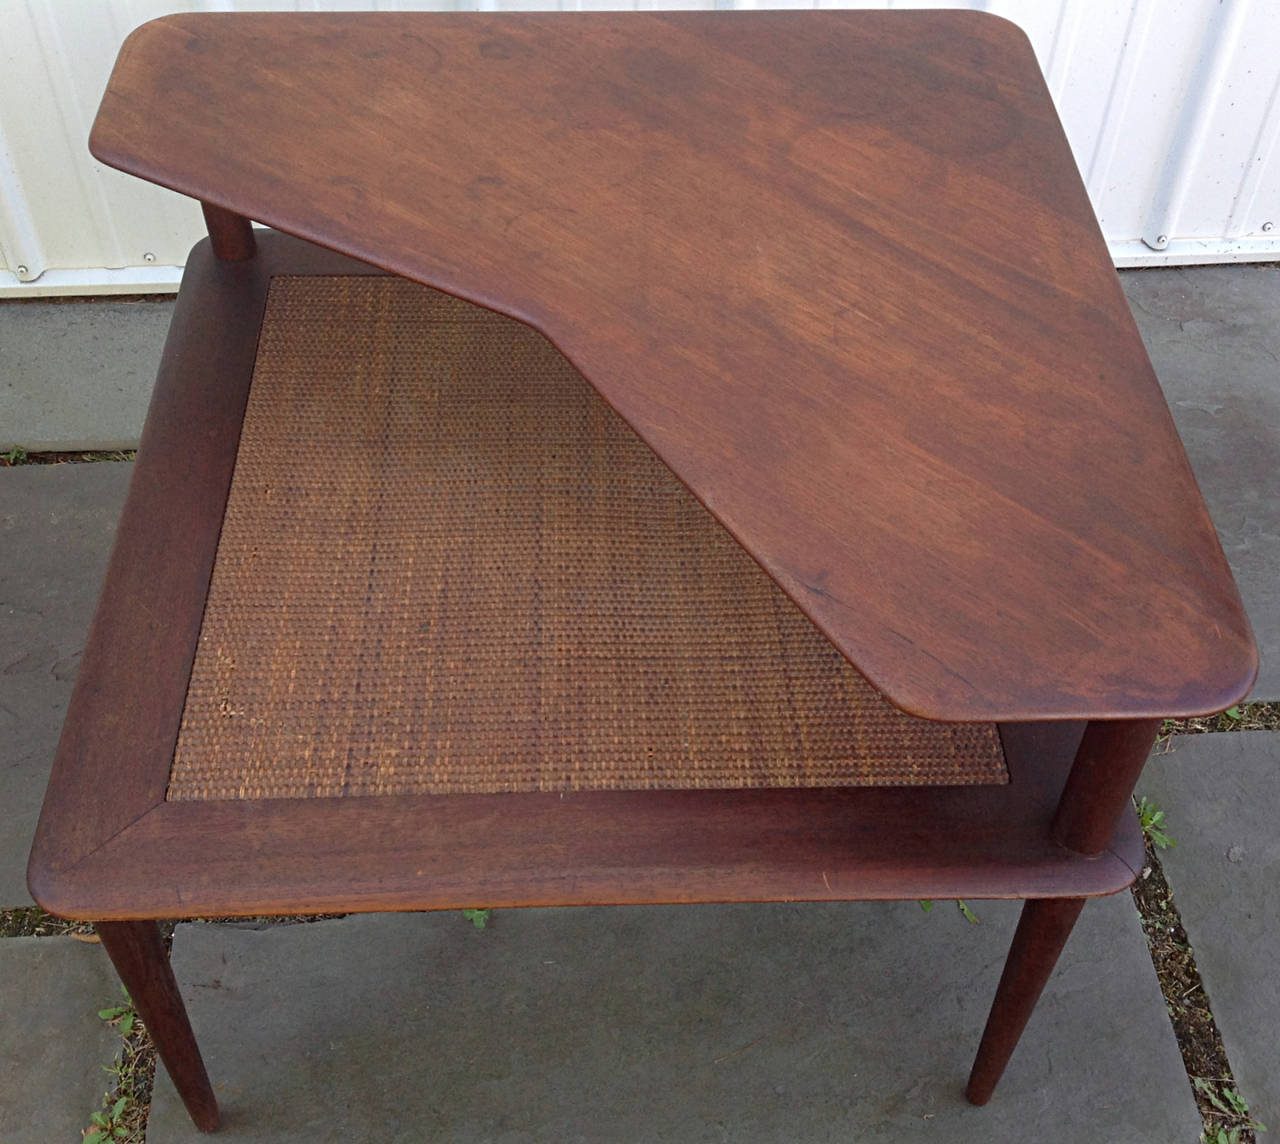 Minerva Group Corner Table In Teak By Hvidt And Molgaard For France - Mid century modern corner table